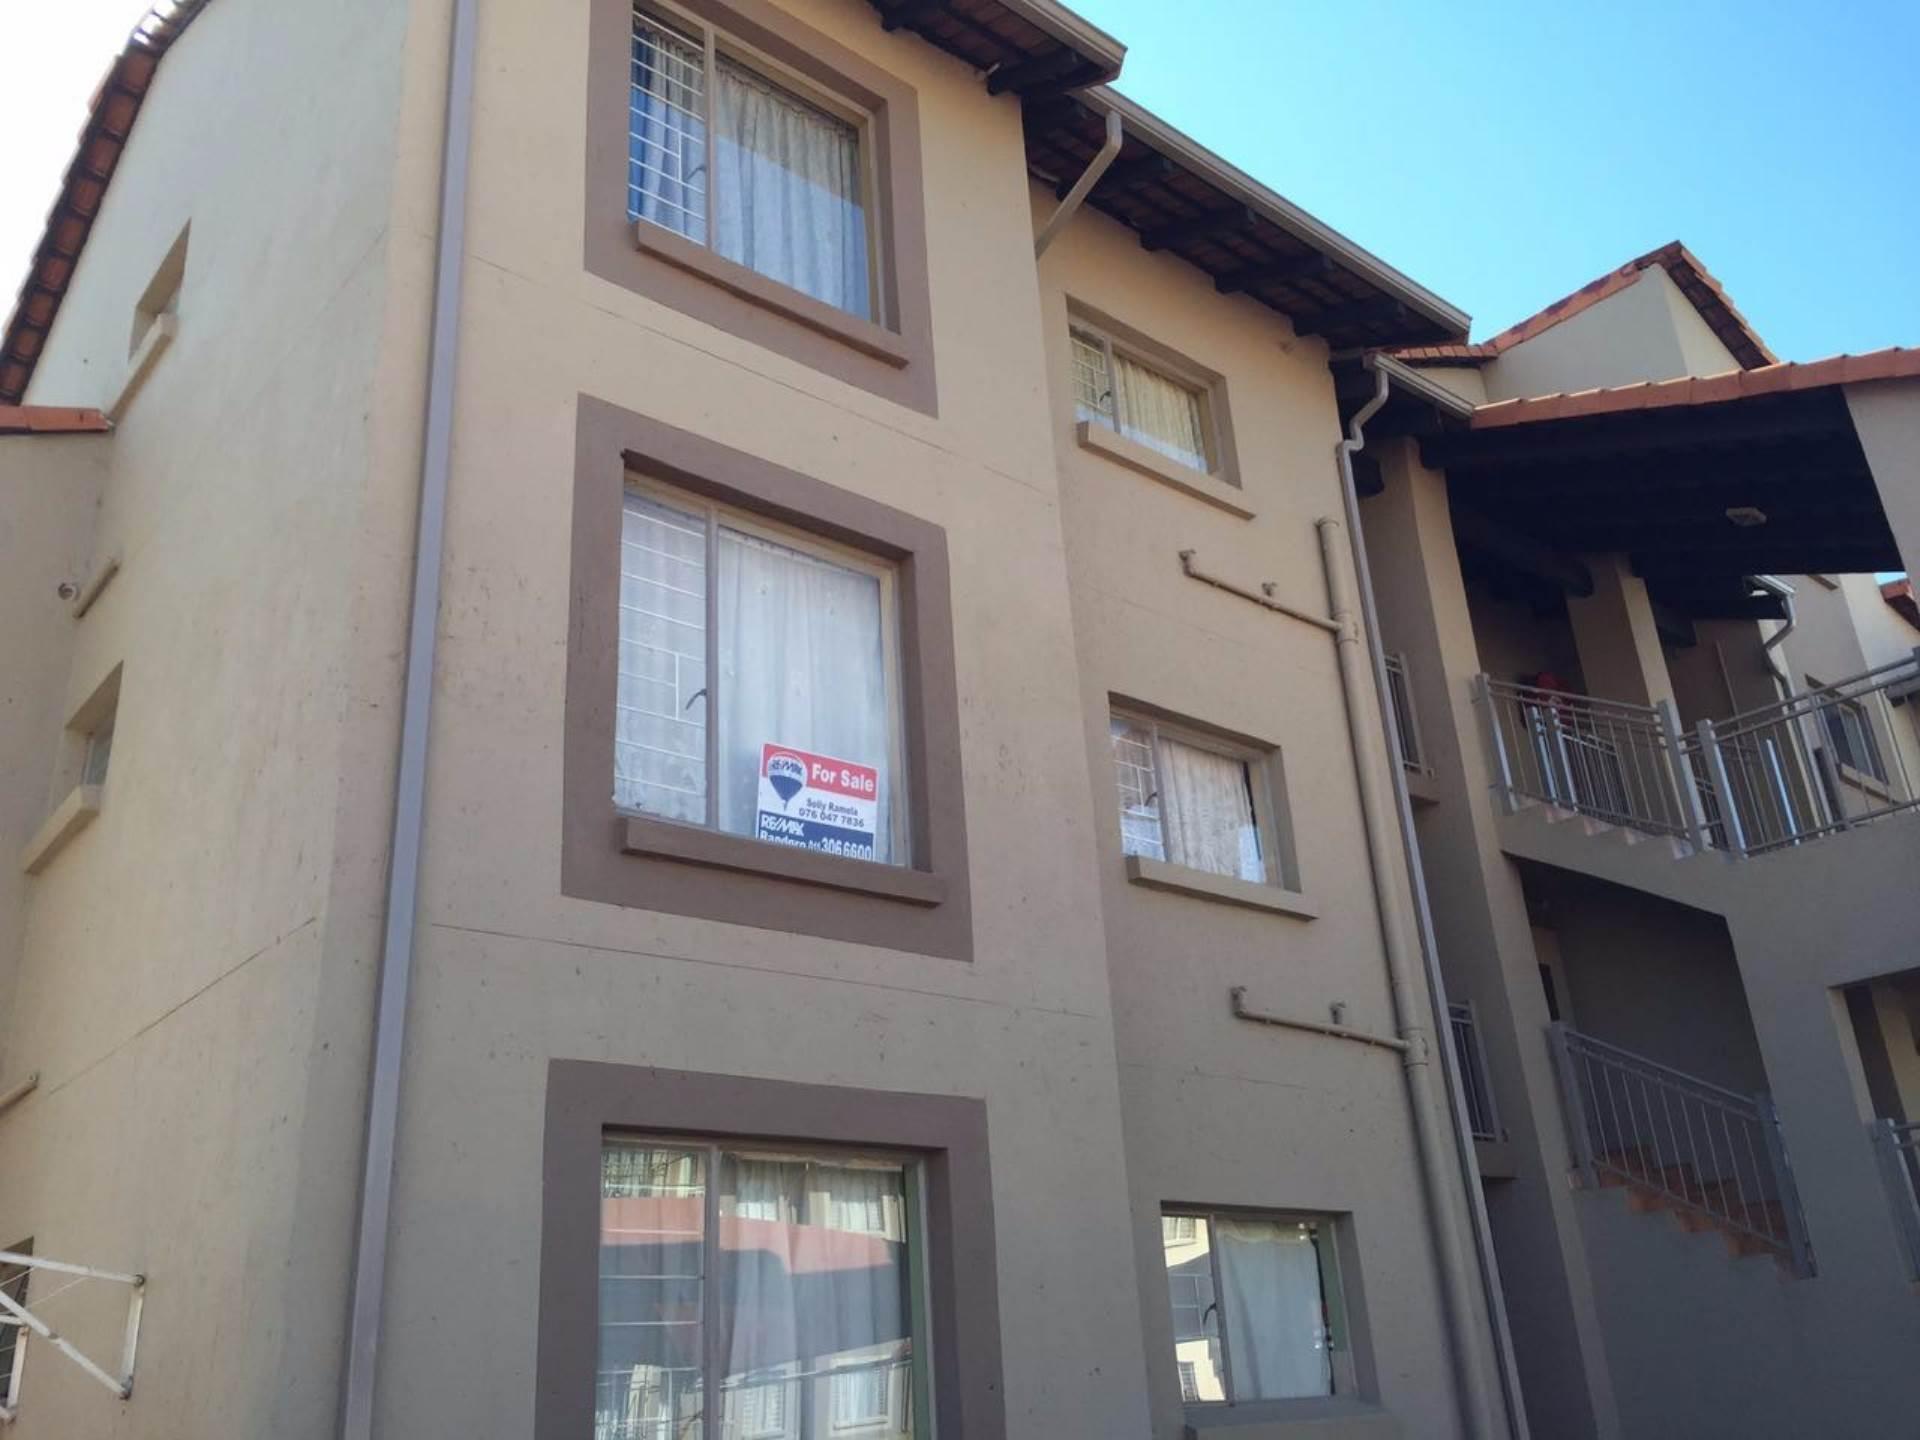 2 BedroomTownhouse To Rent In Benoni